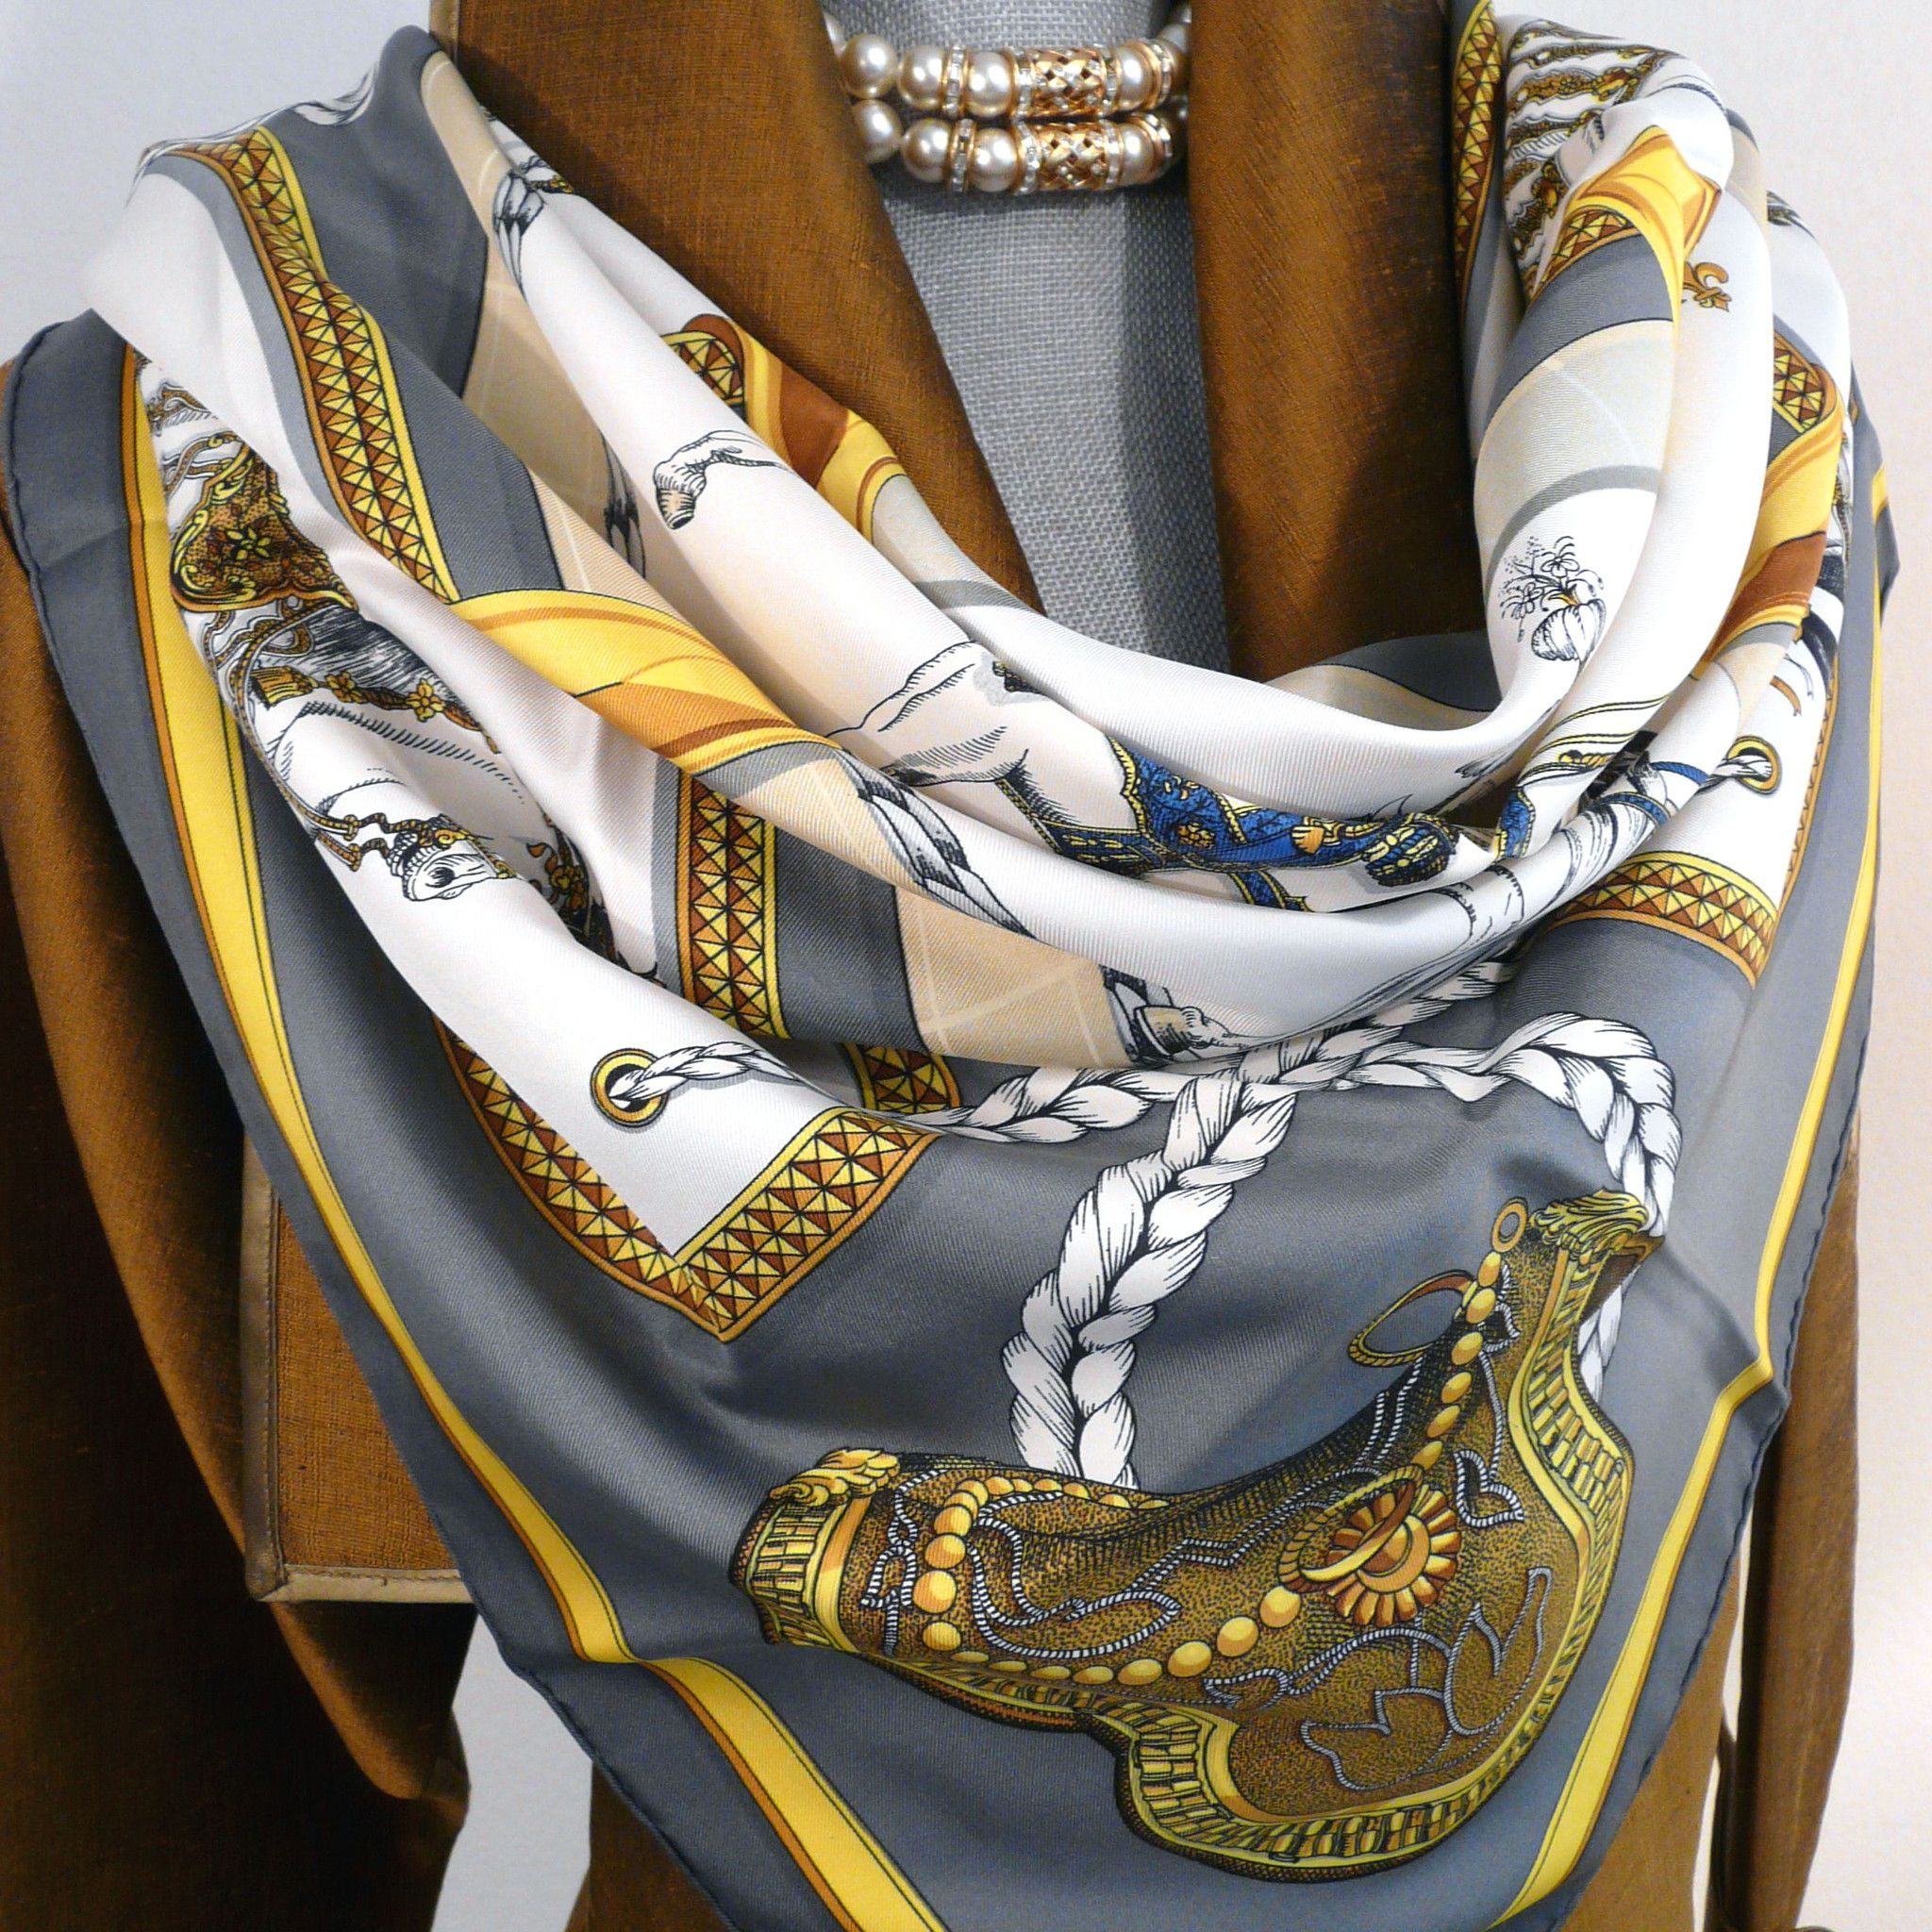 franco ferrari elements woven scarf